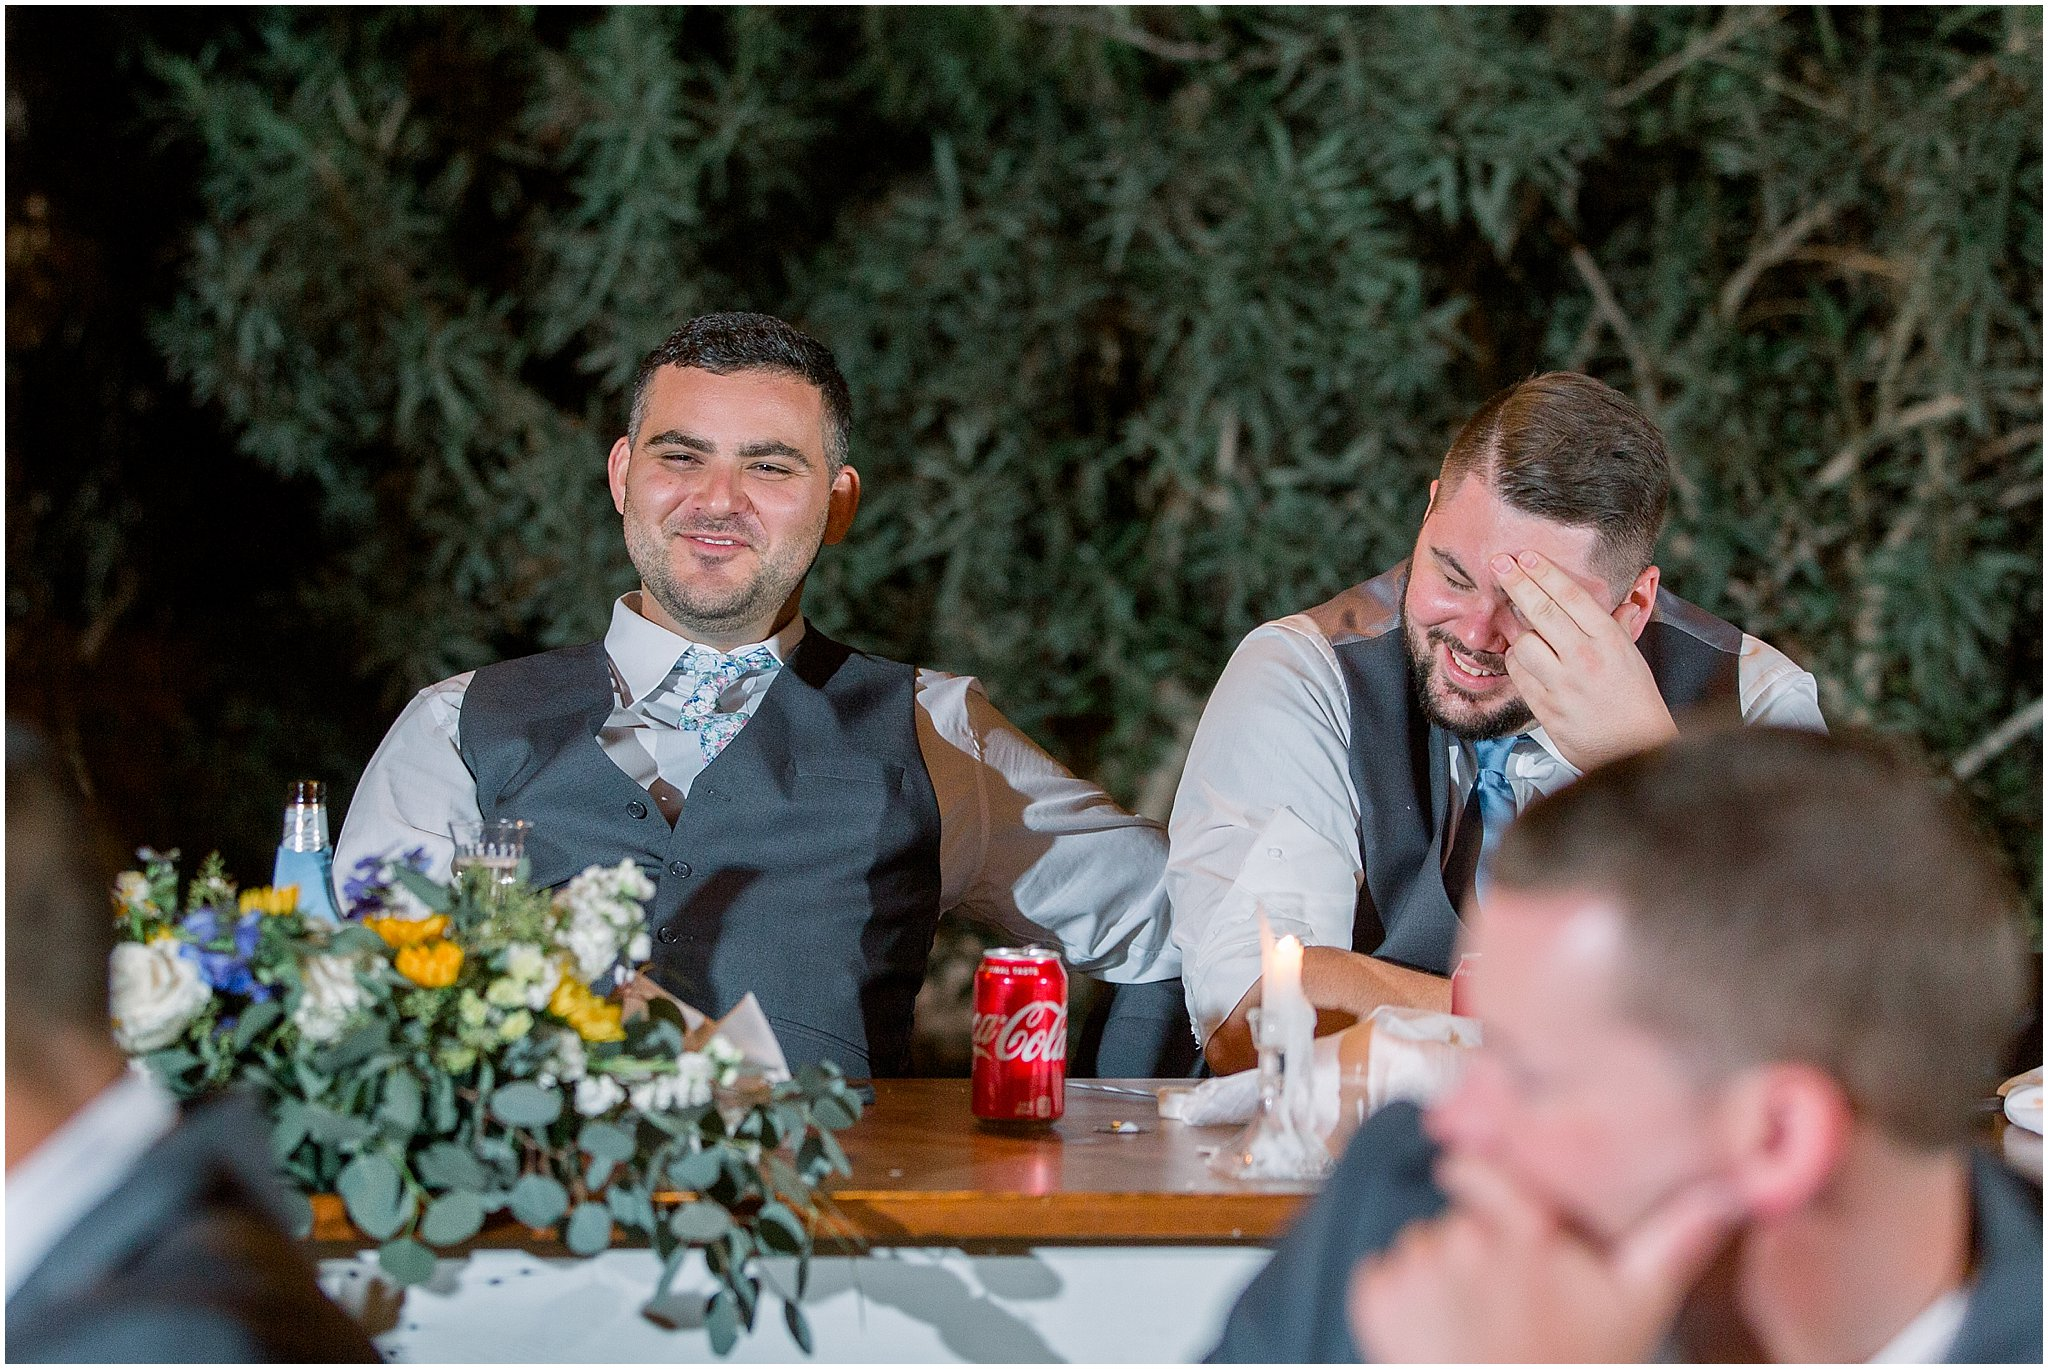 schnepf-farms-queen-creek-arizona-wedding_0010.jpg